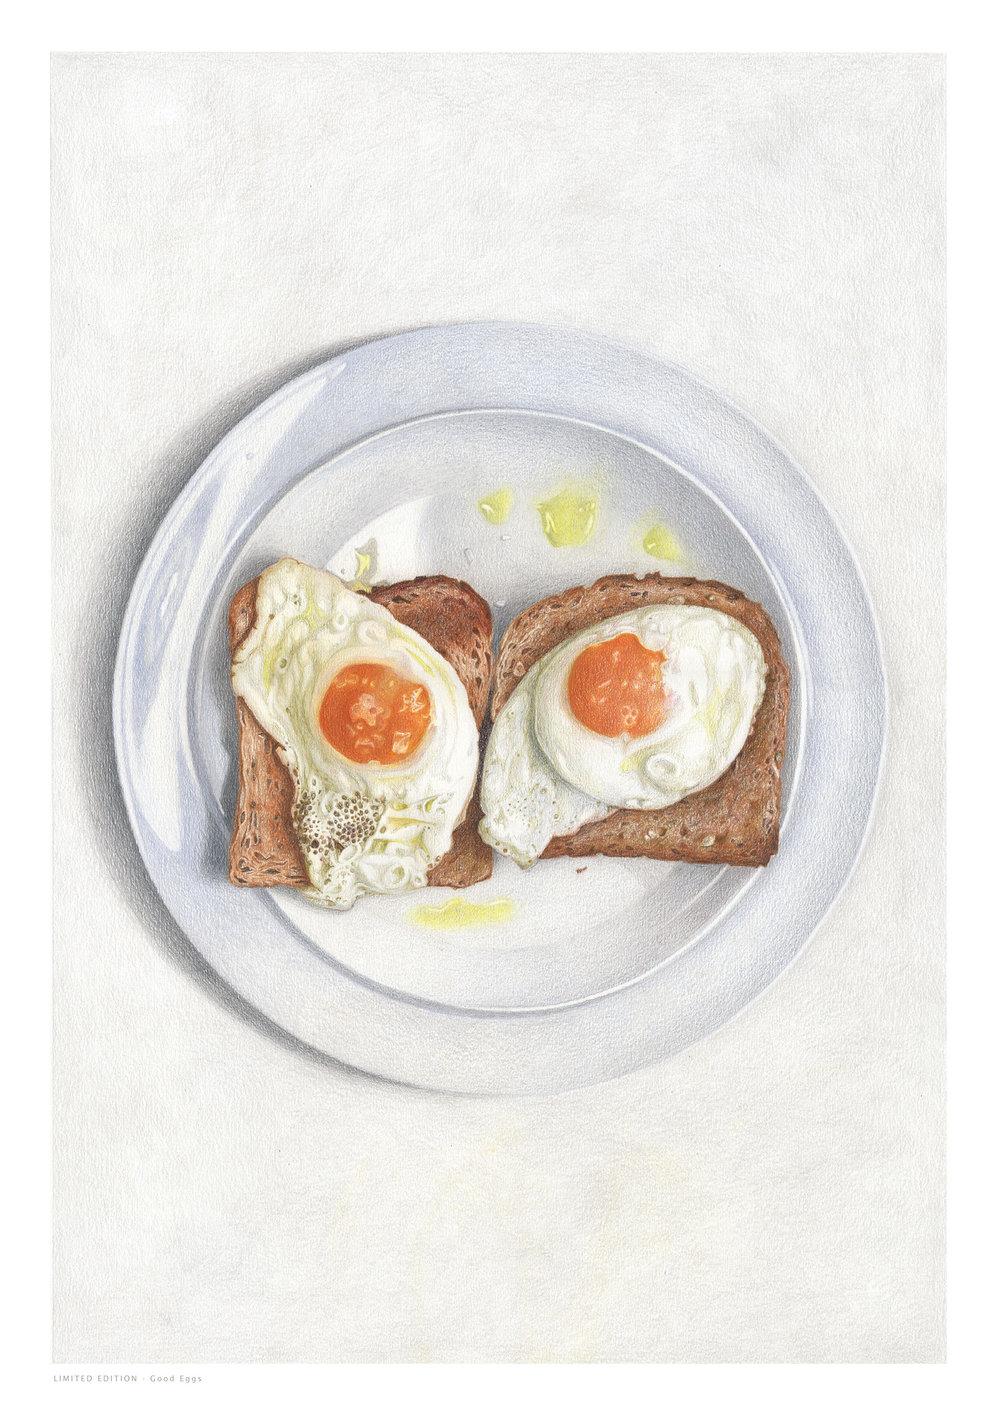 Good eggs - Colored Pencil60 x 40